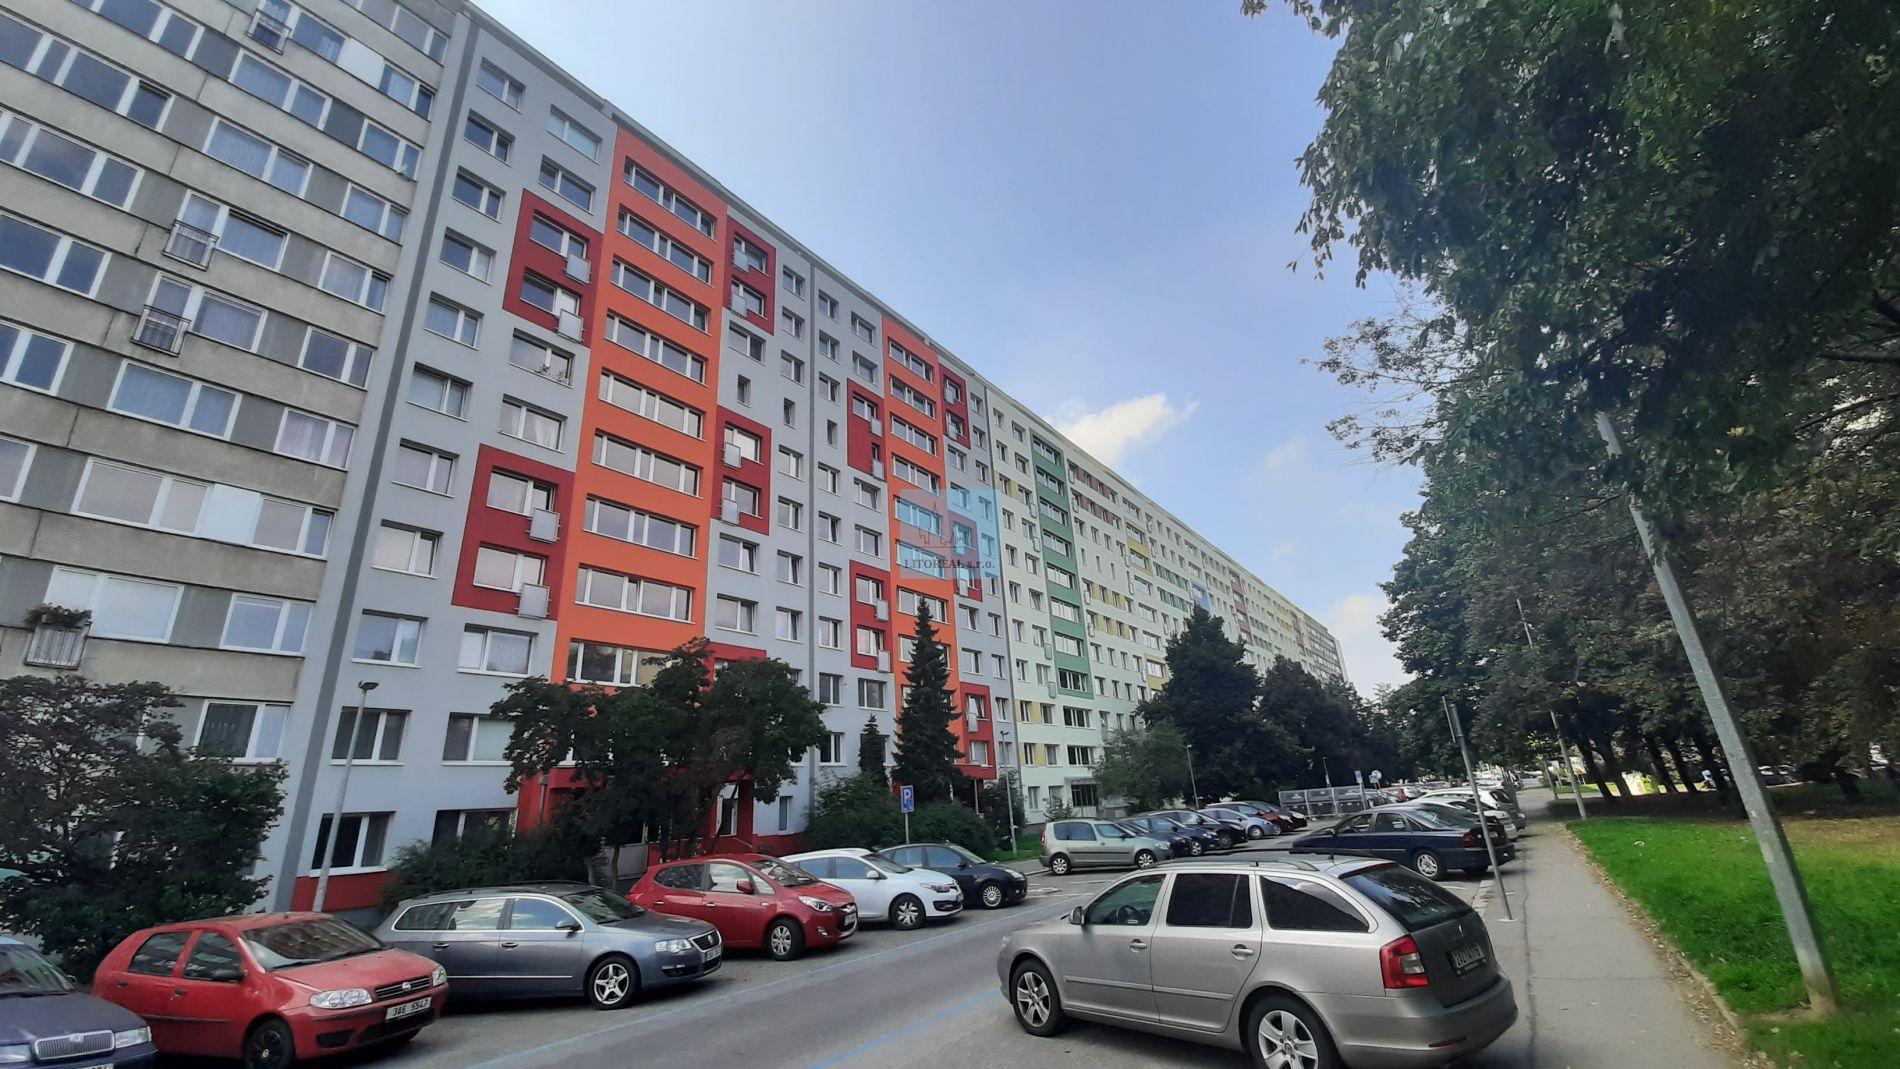 Prodej bytu 2+kk s lodžií, 43m2, ul.Jablonecká, Praha 9 - Prosek